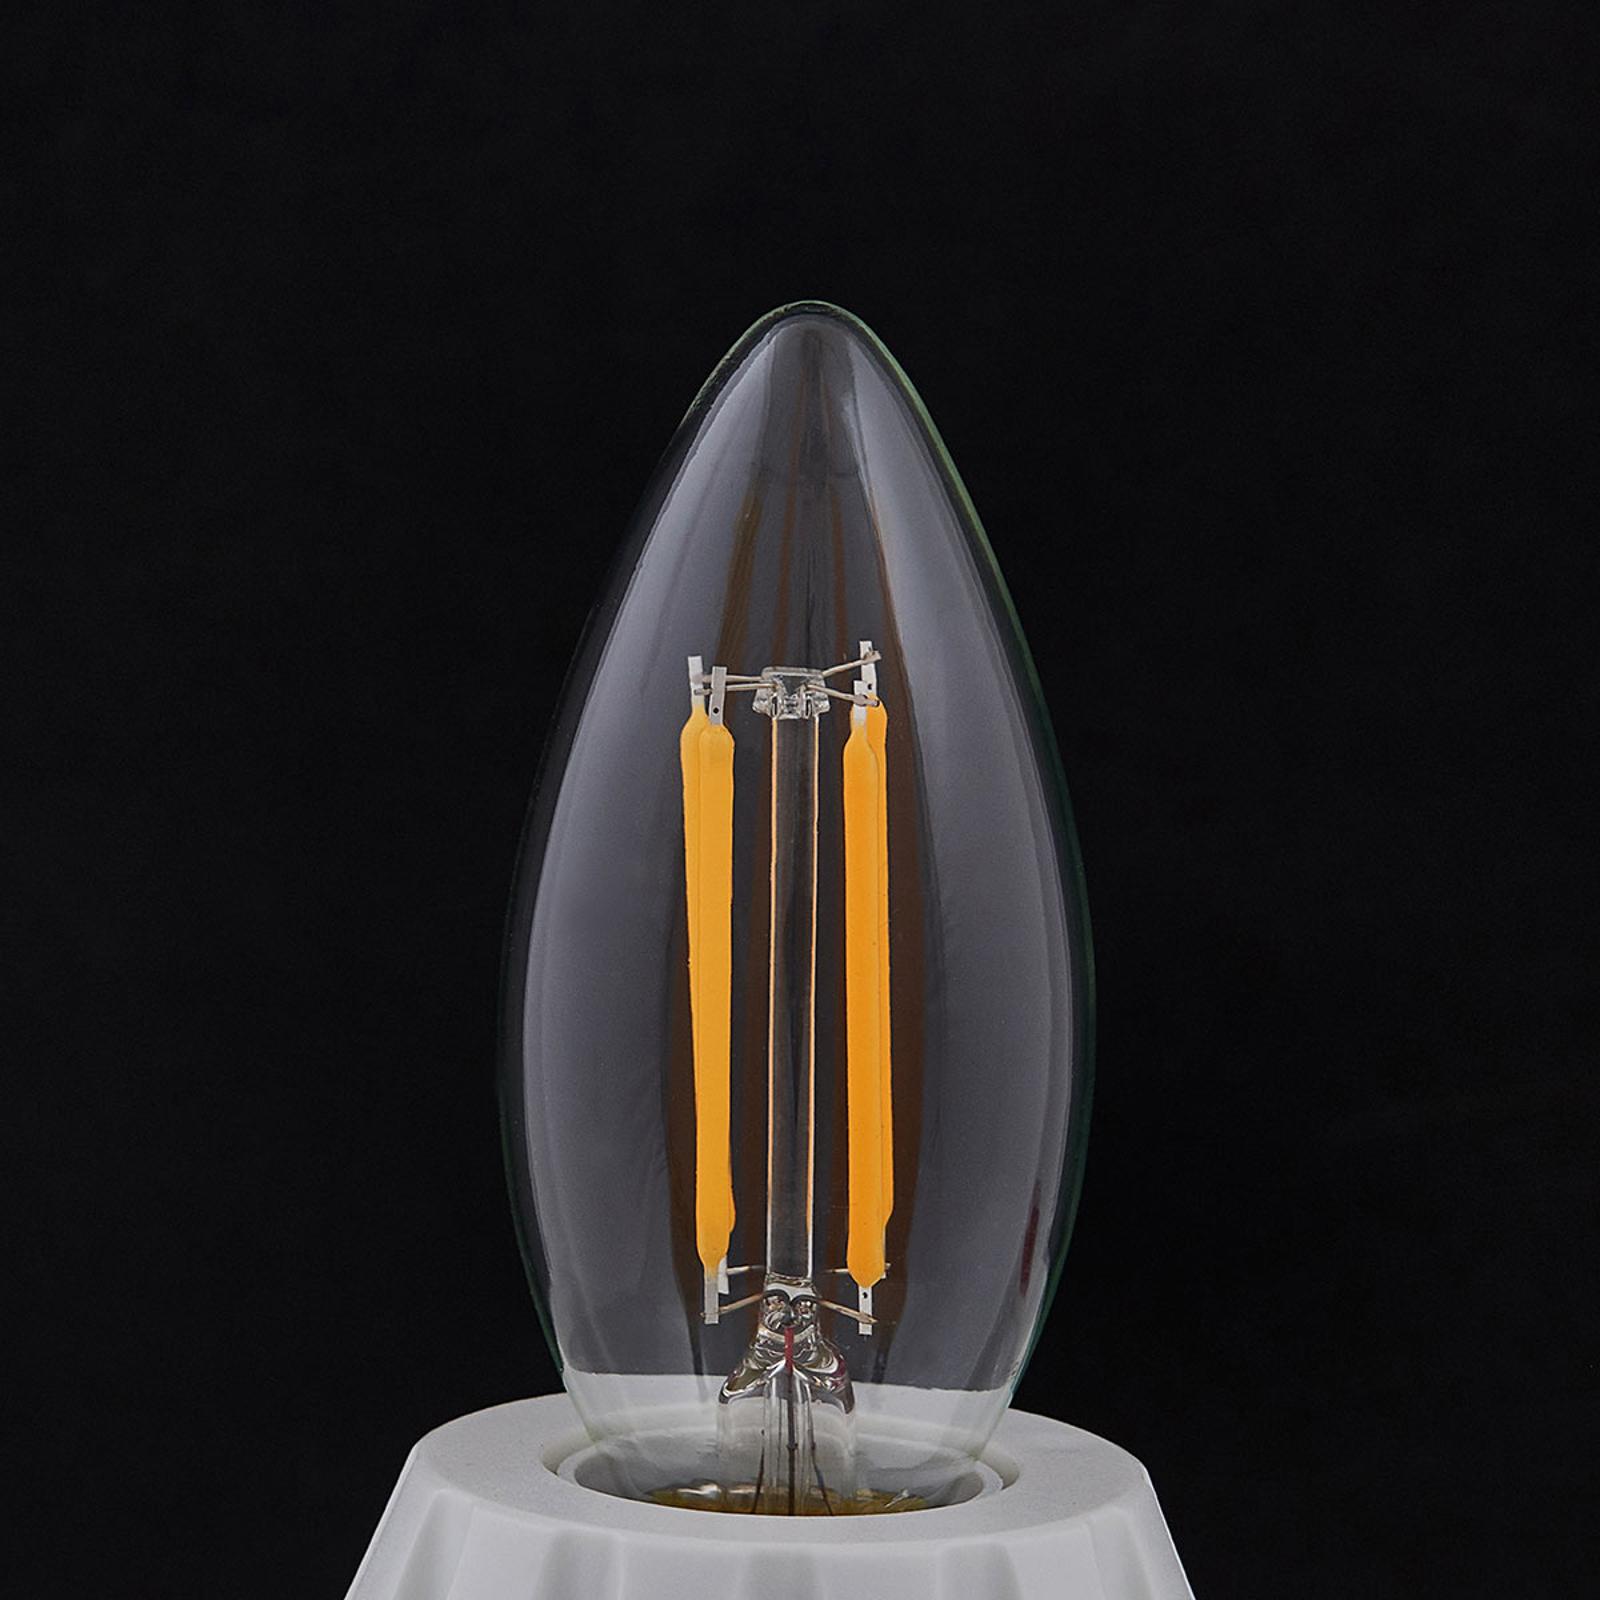 E14 LED-Kerzenlampe Filament 4W, 470 lm, 2.700 K